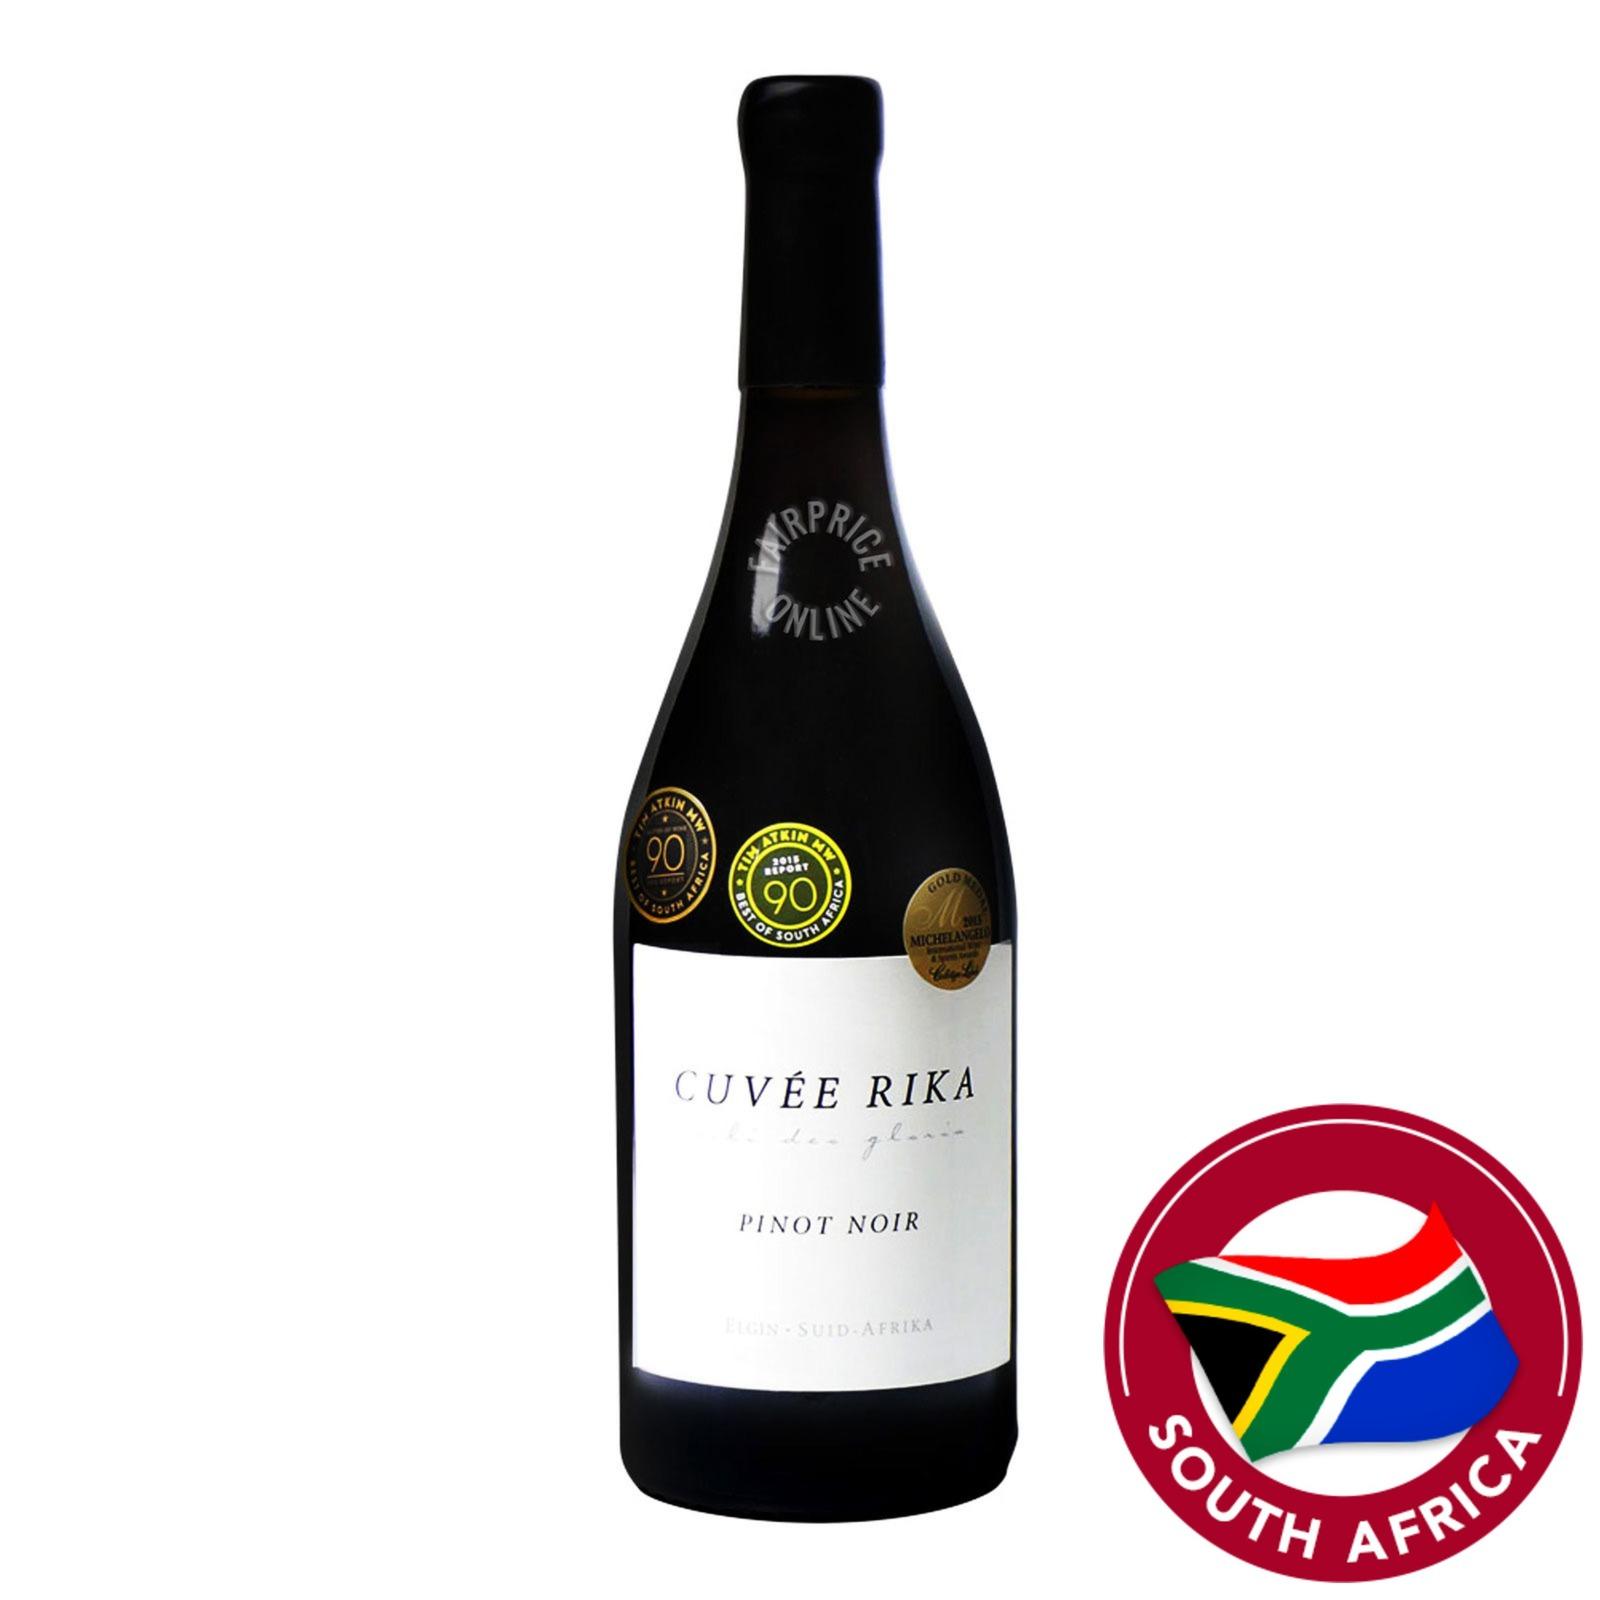 Longridge Cuvee Rika Red Wine - Pinot Noir